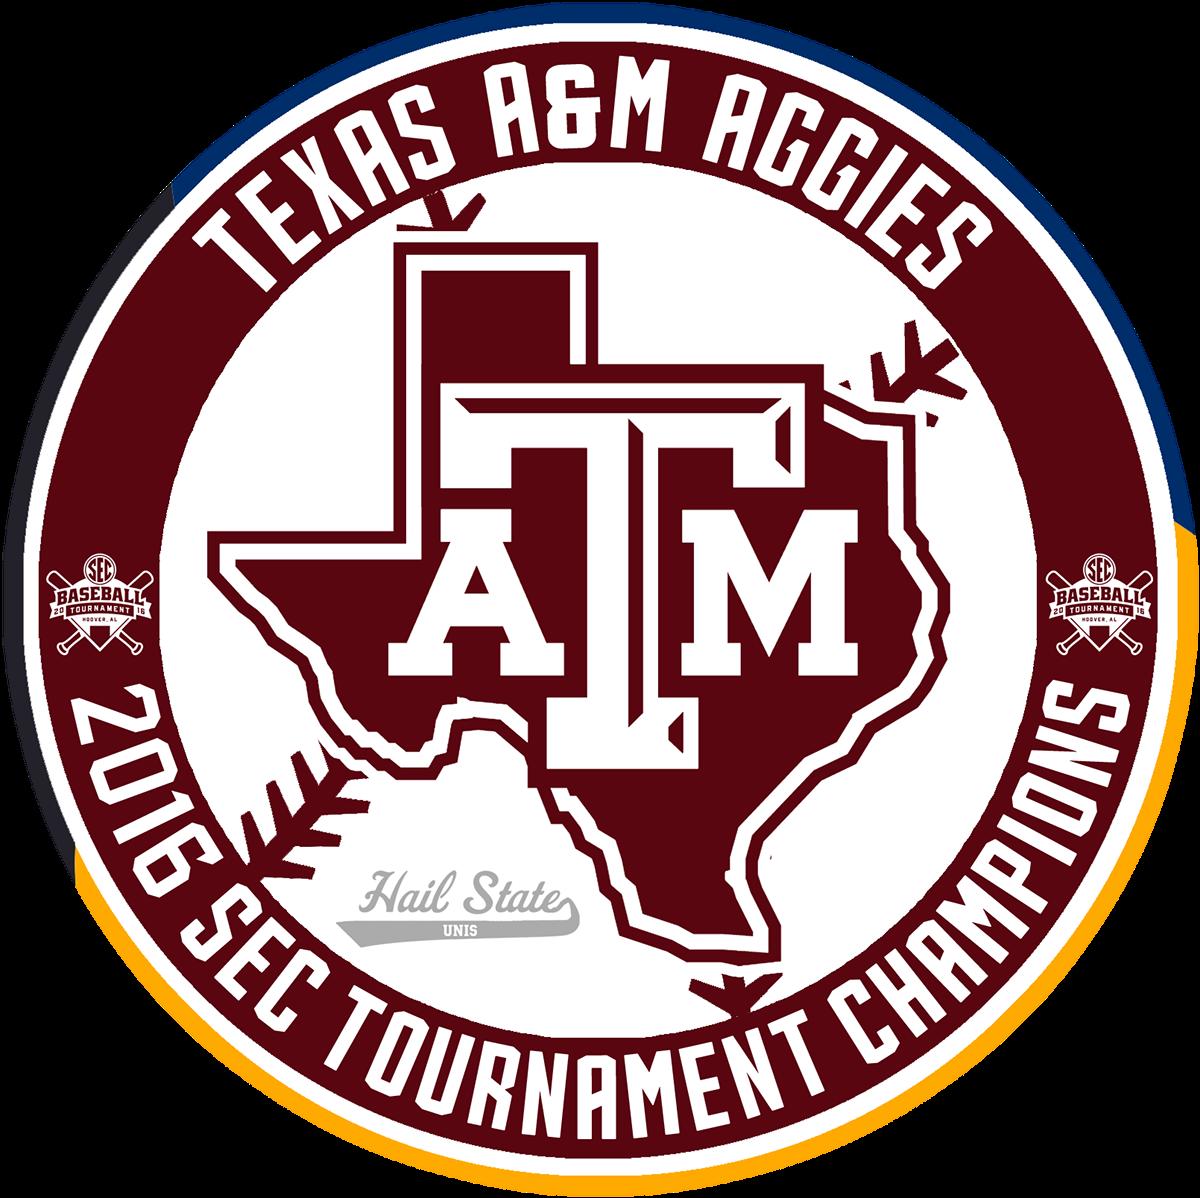 MSU 2016 SEC Baseball Champions Roundel